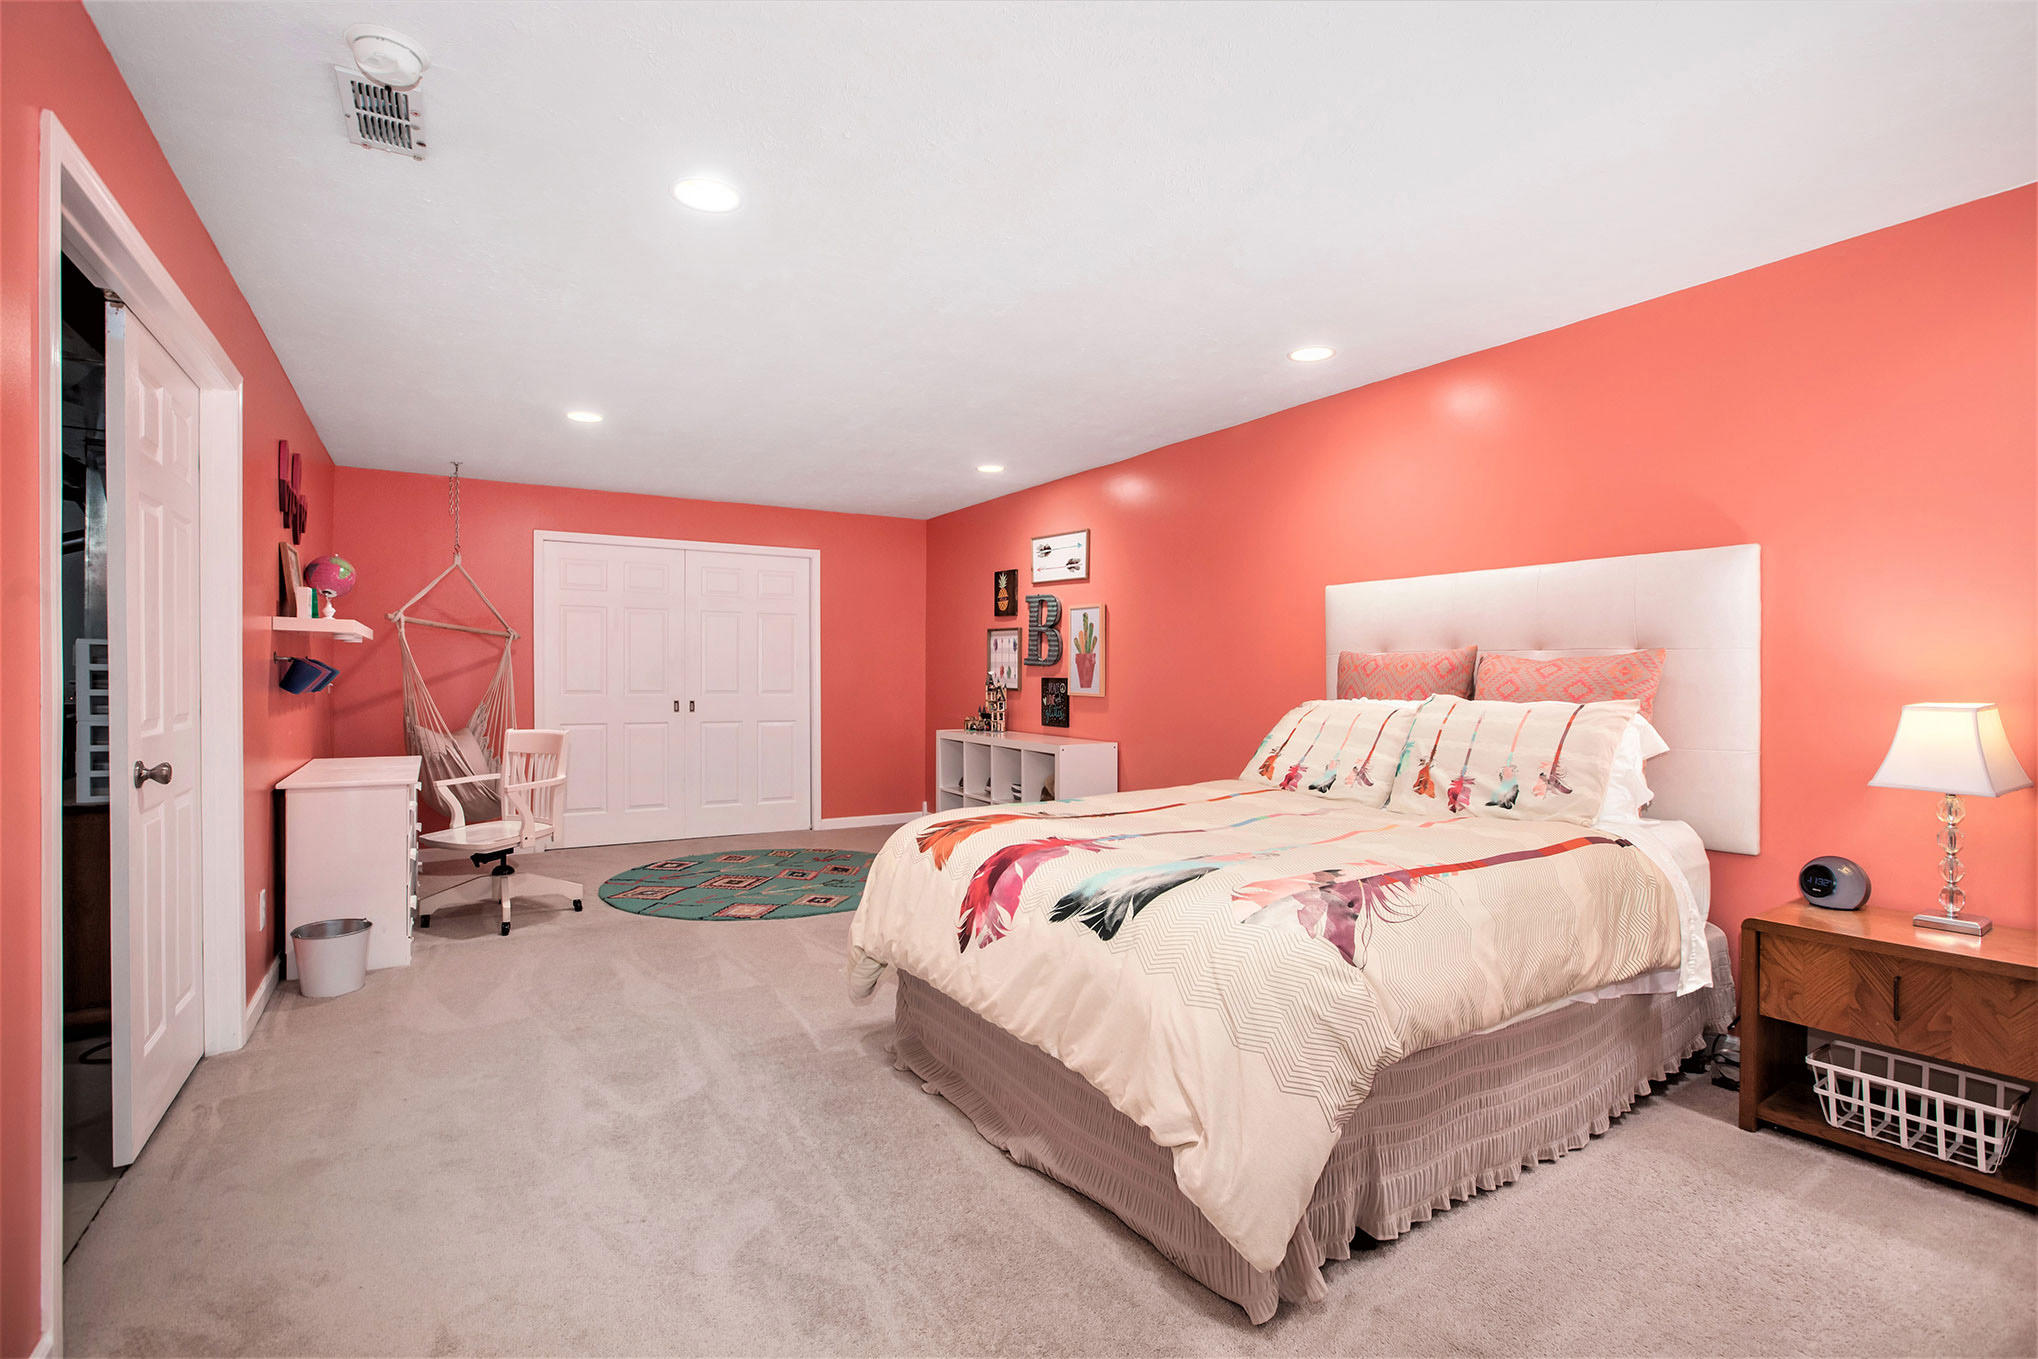 Sold 2223 Long Leaf Street Kalamazoo Mi 49006 3 Beds 3 Full Baths 308 000 Sold Listing Mls 21014292